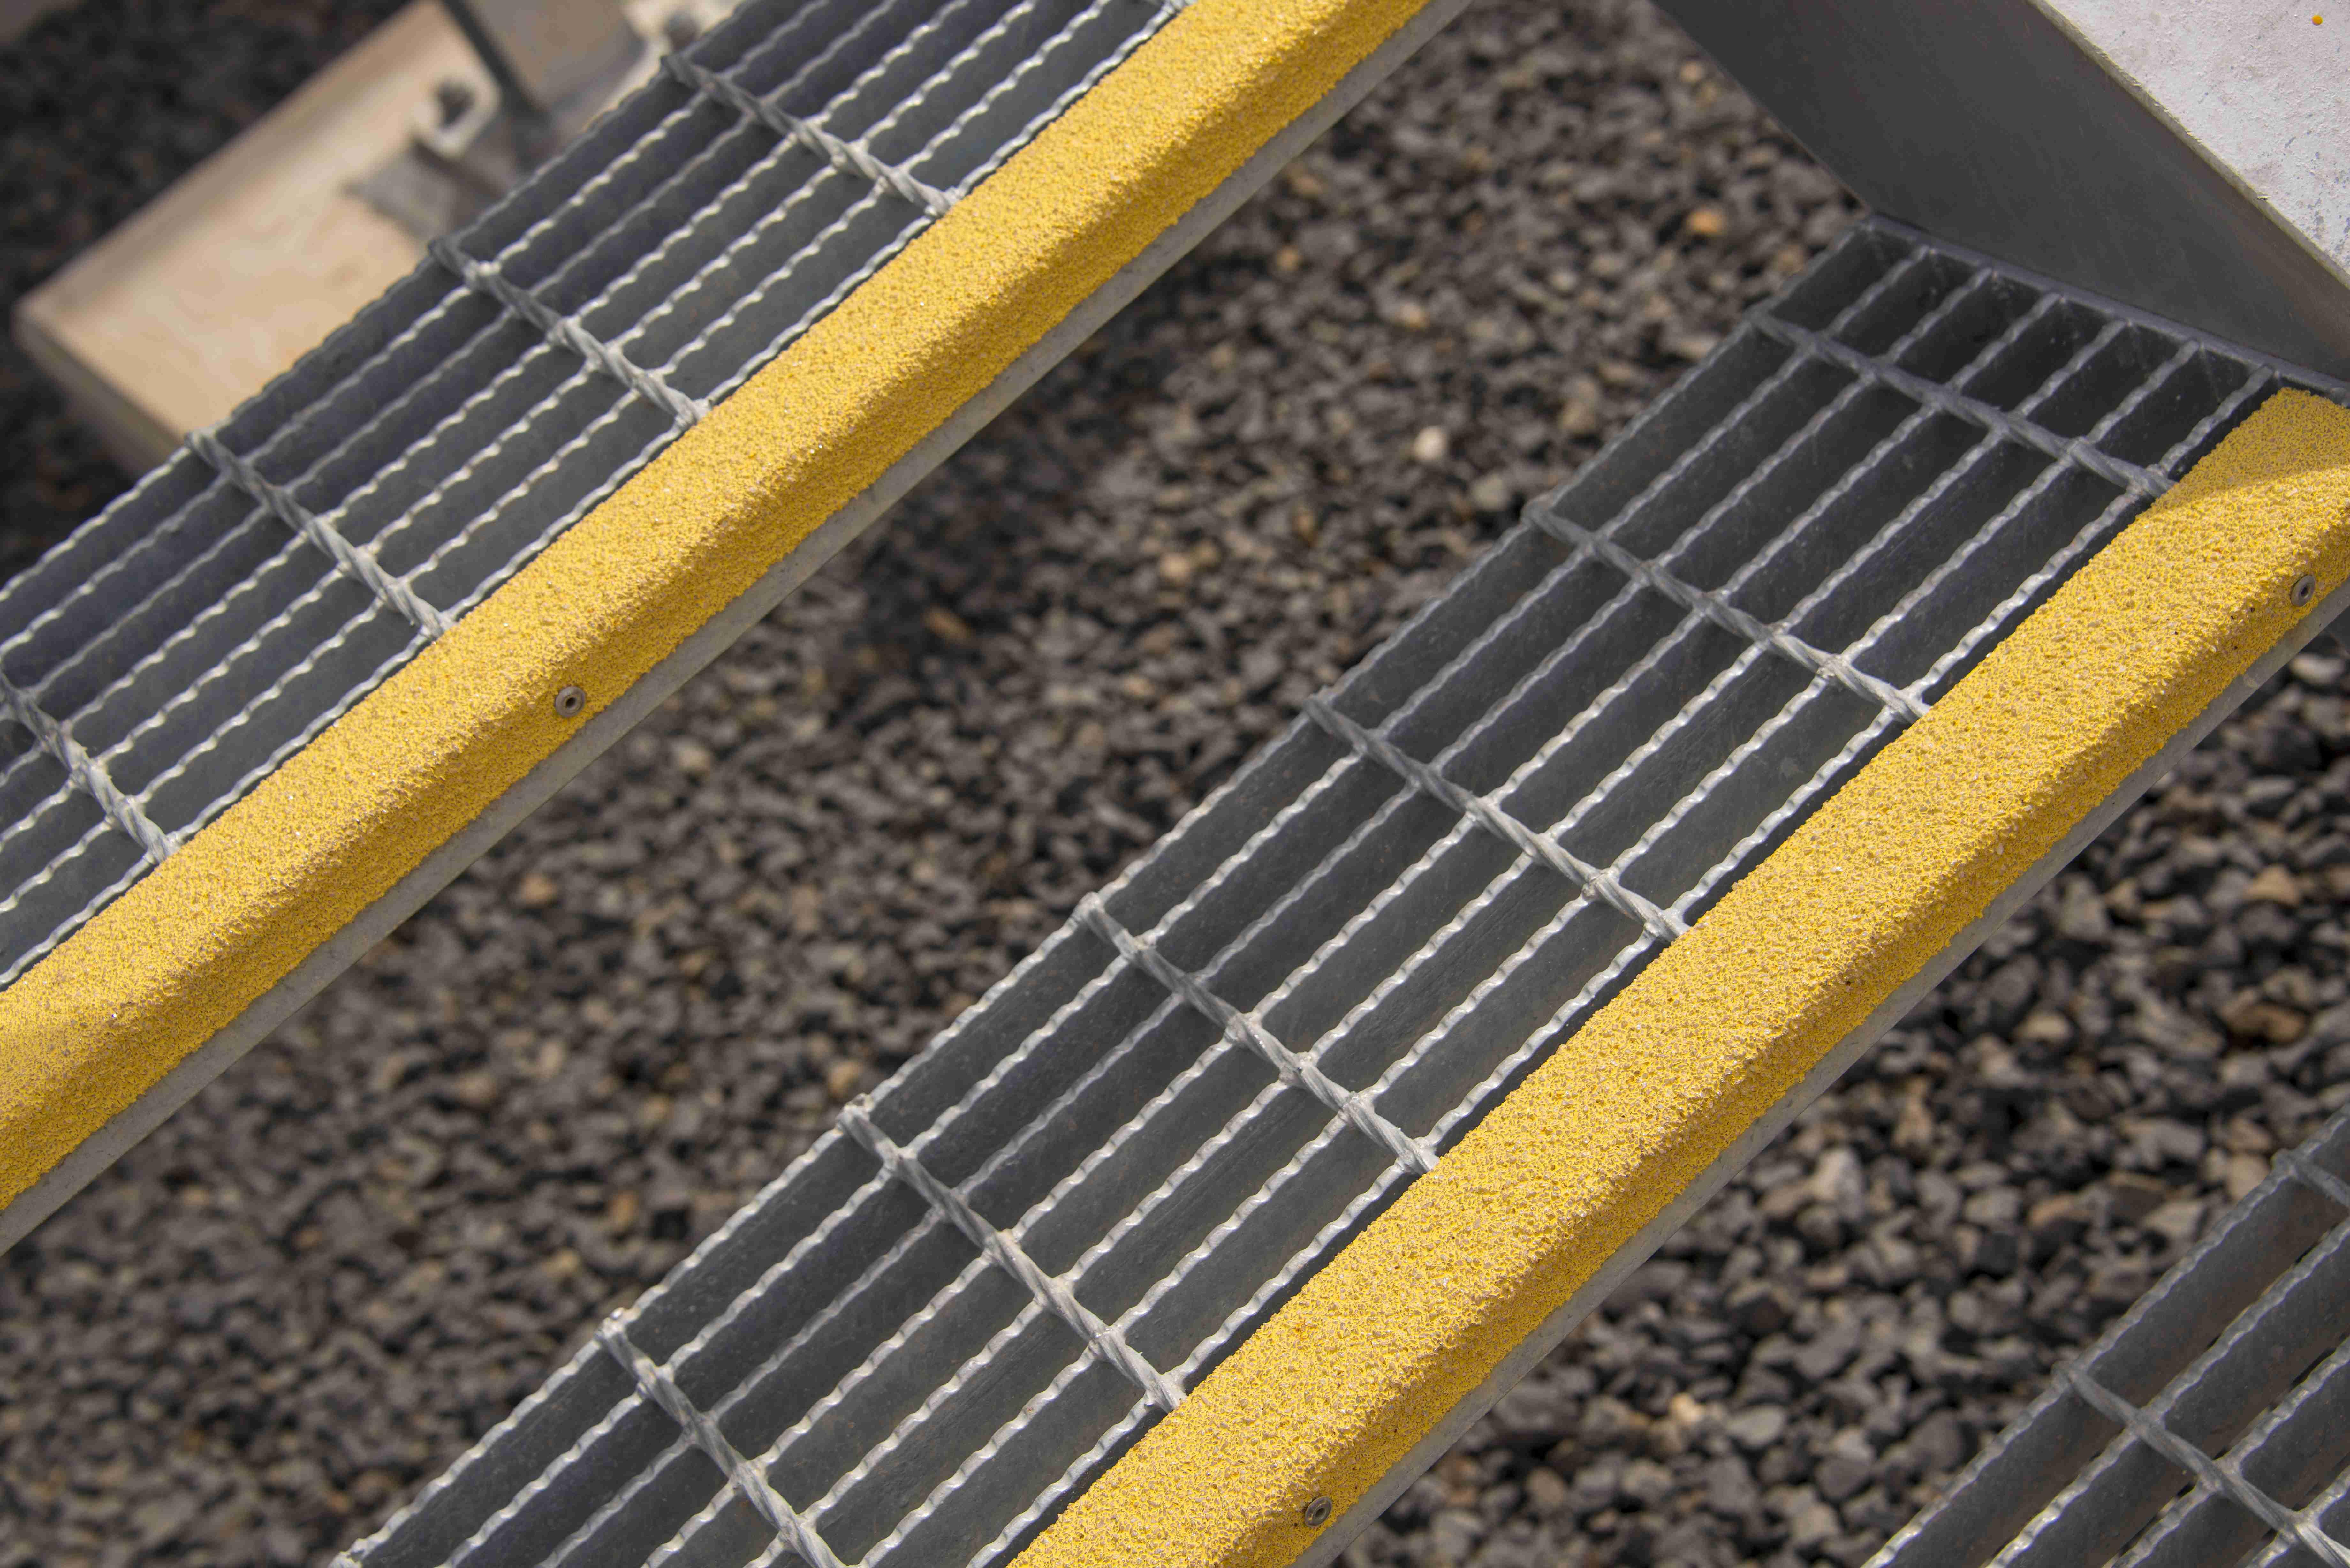 Stair Treads _LNG Plant QLD Aus